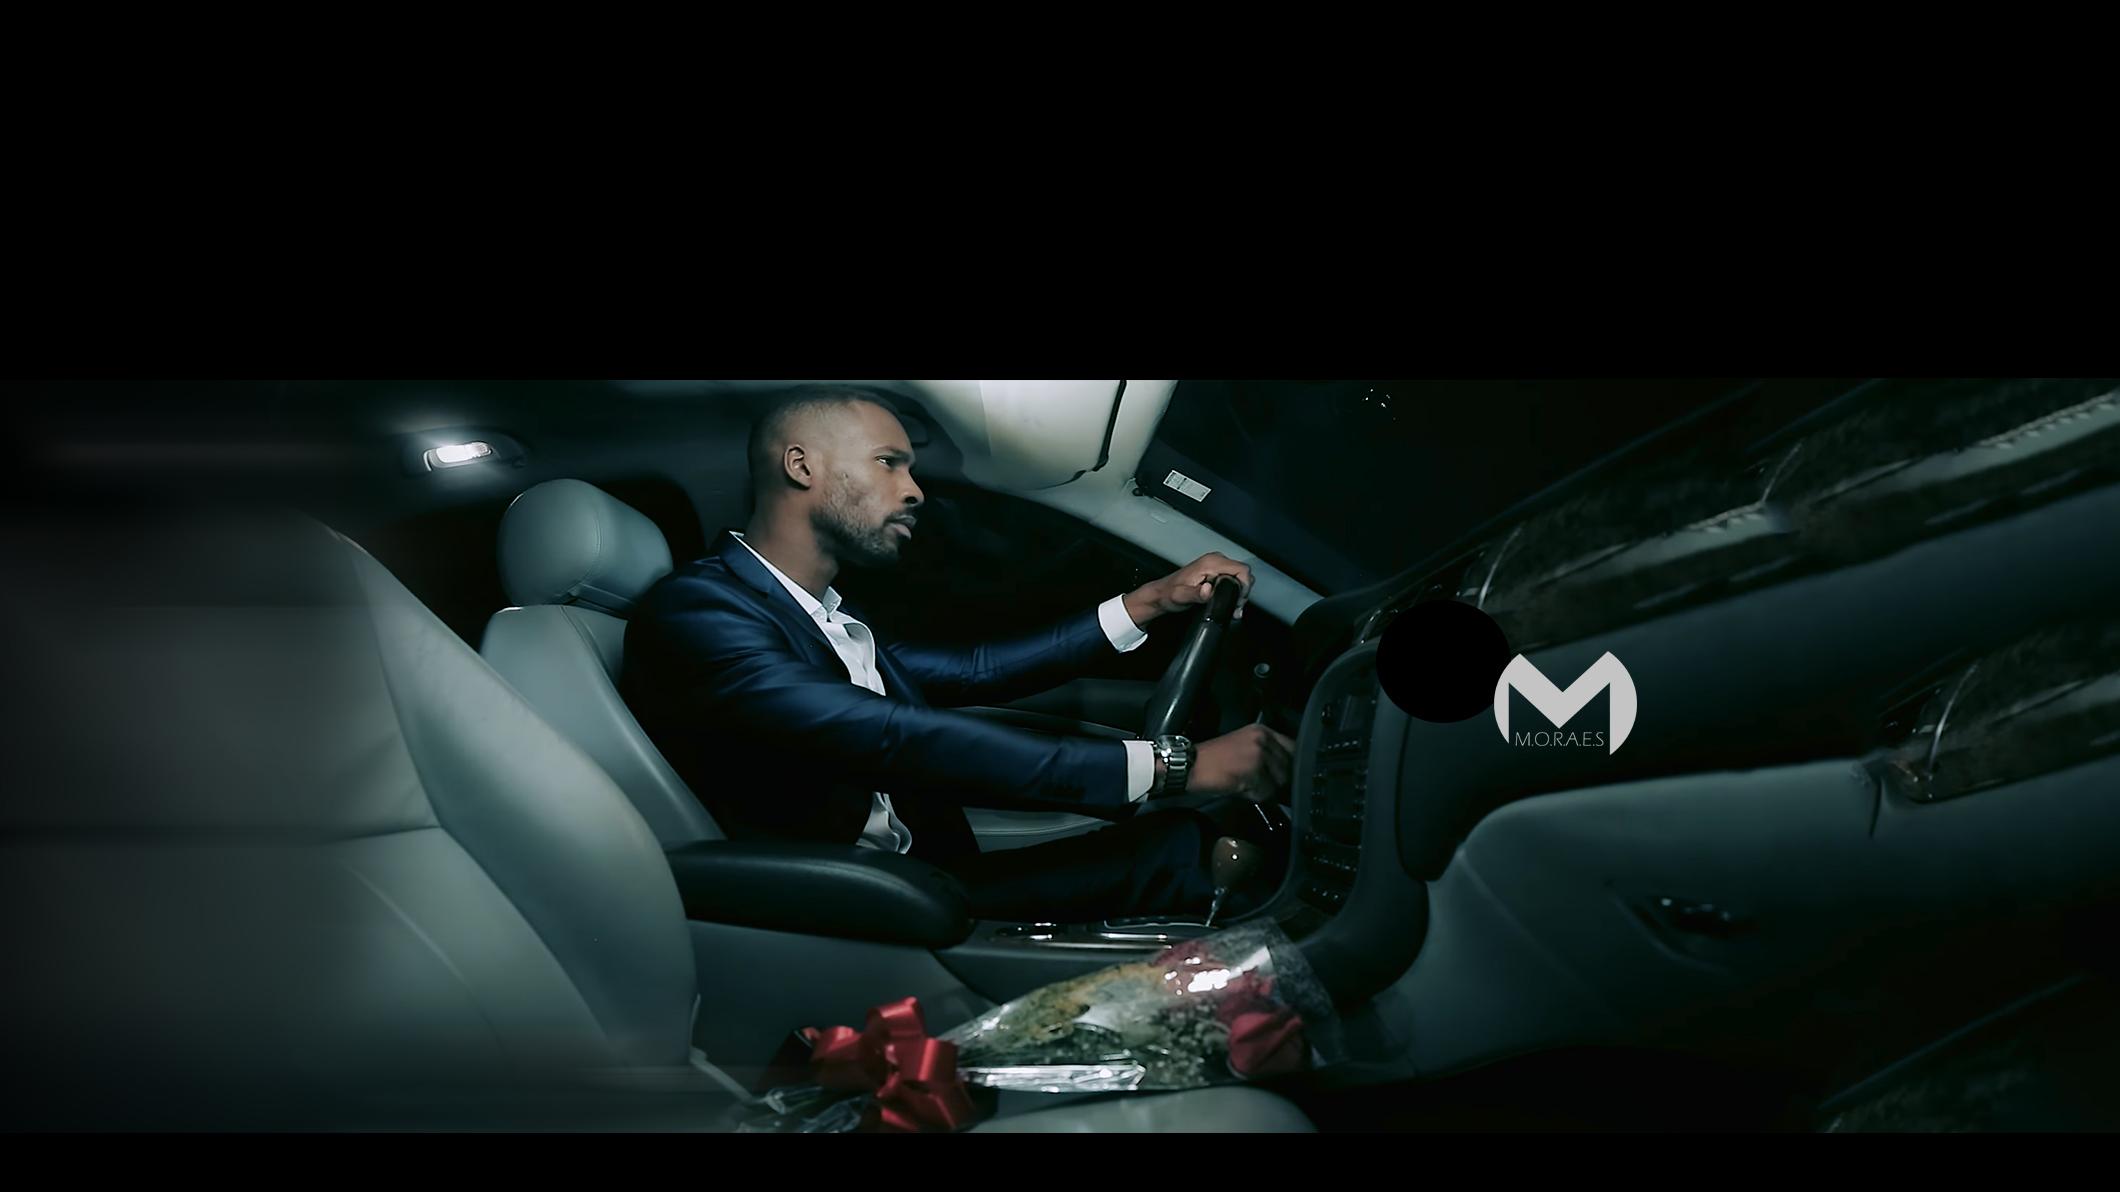 videoclipe - Rala Mané - Moraes Oficial - rap, hits 2018, pop